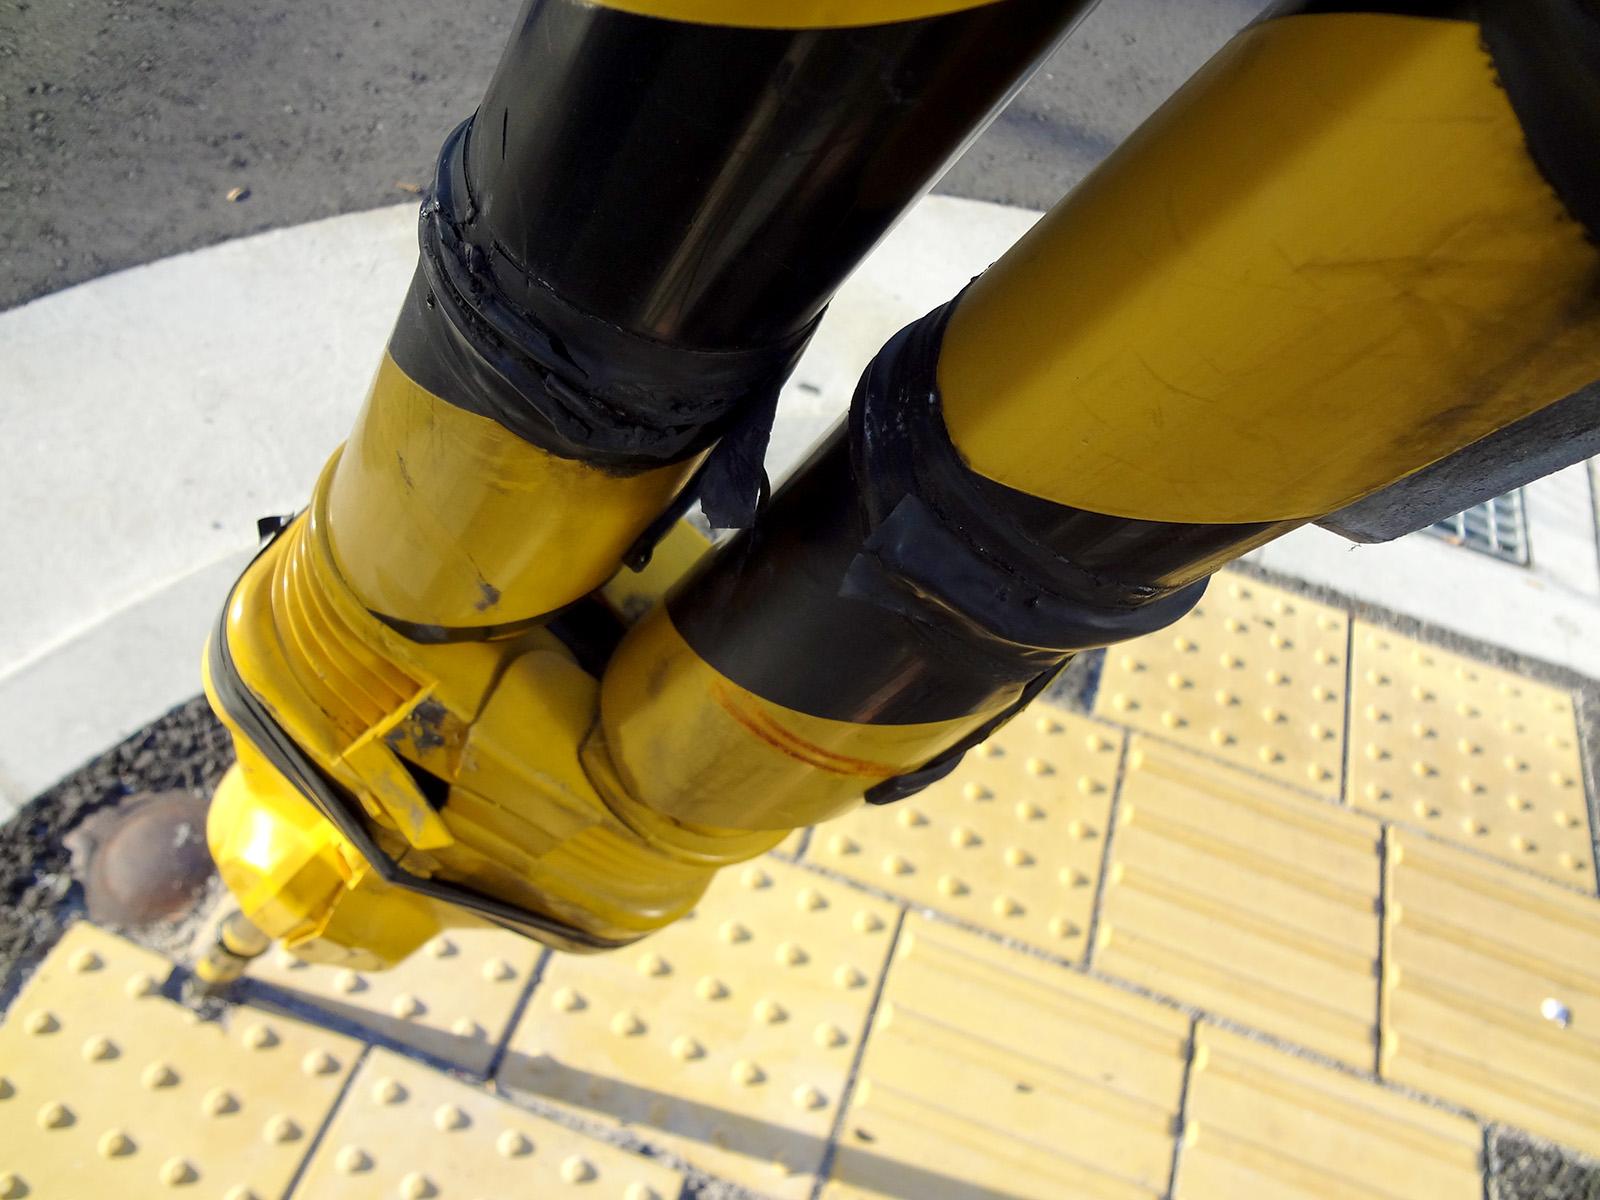 Yellow power line and sidewalk